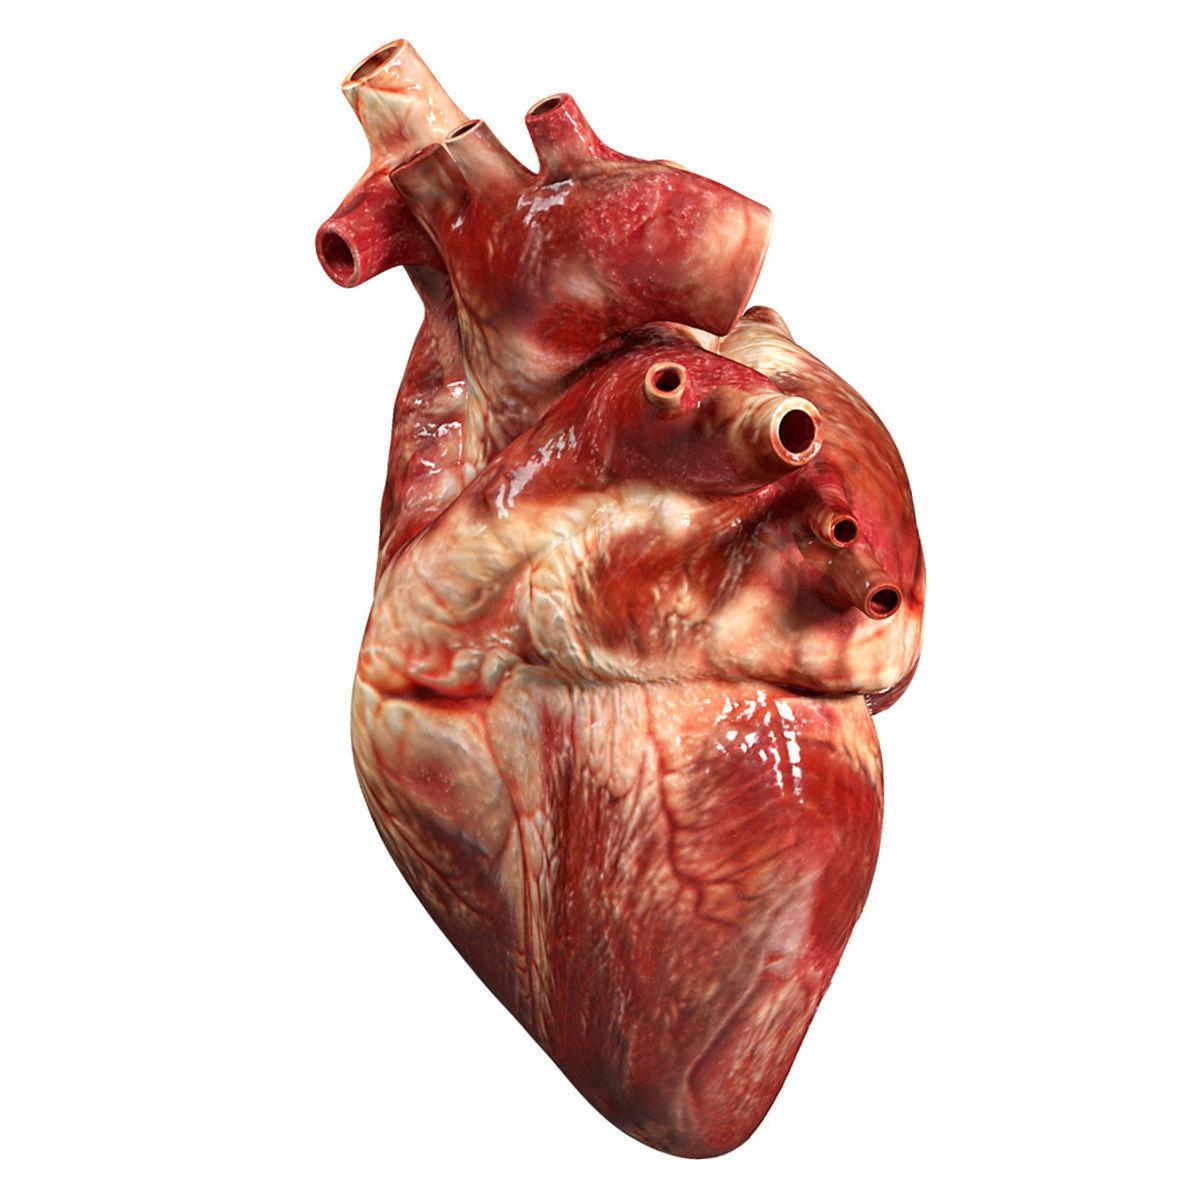 Accurate Human Heart 3d Model Obj 3ds Fbx Blend Dae Mtl